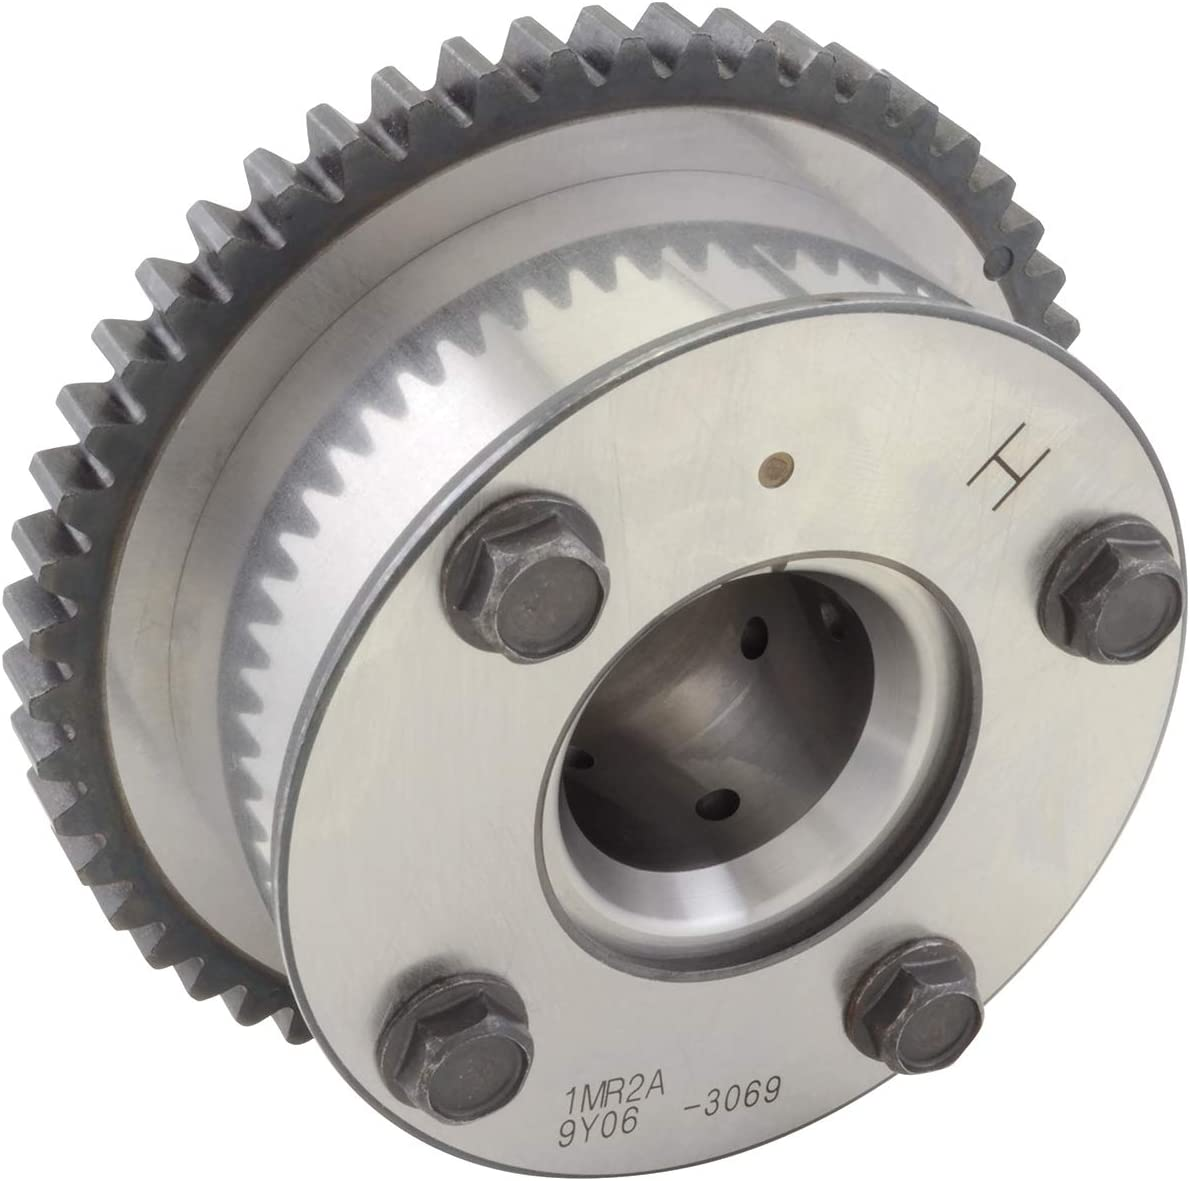 VVT Sprocket Hitachi VTG0020 Engine Variable Valve Timing